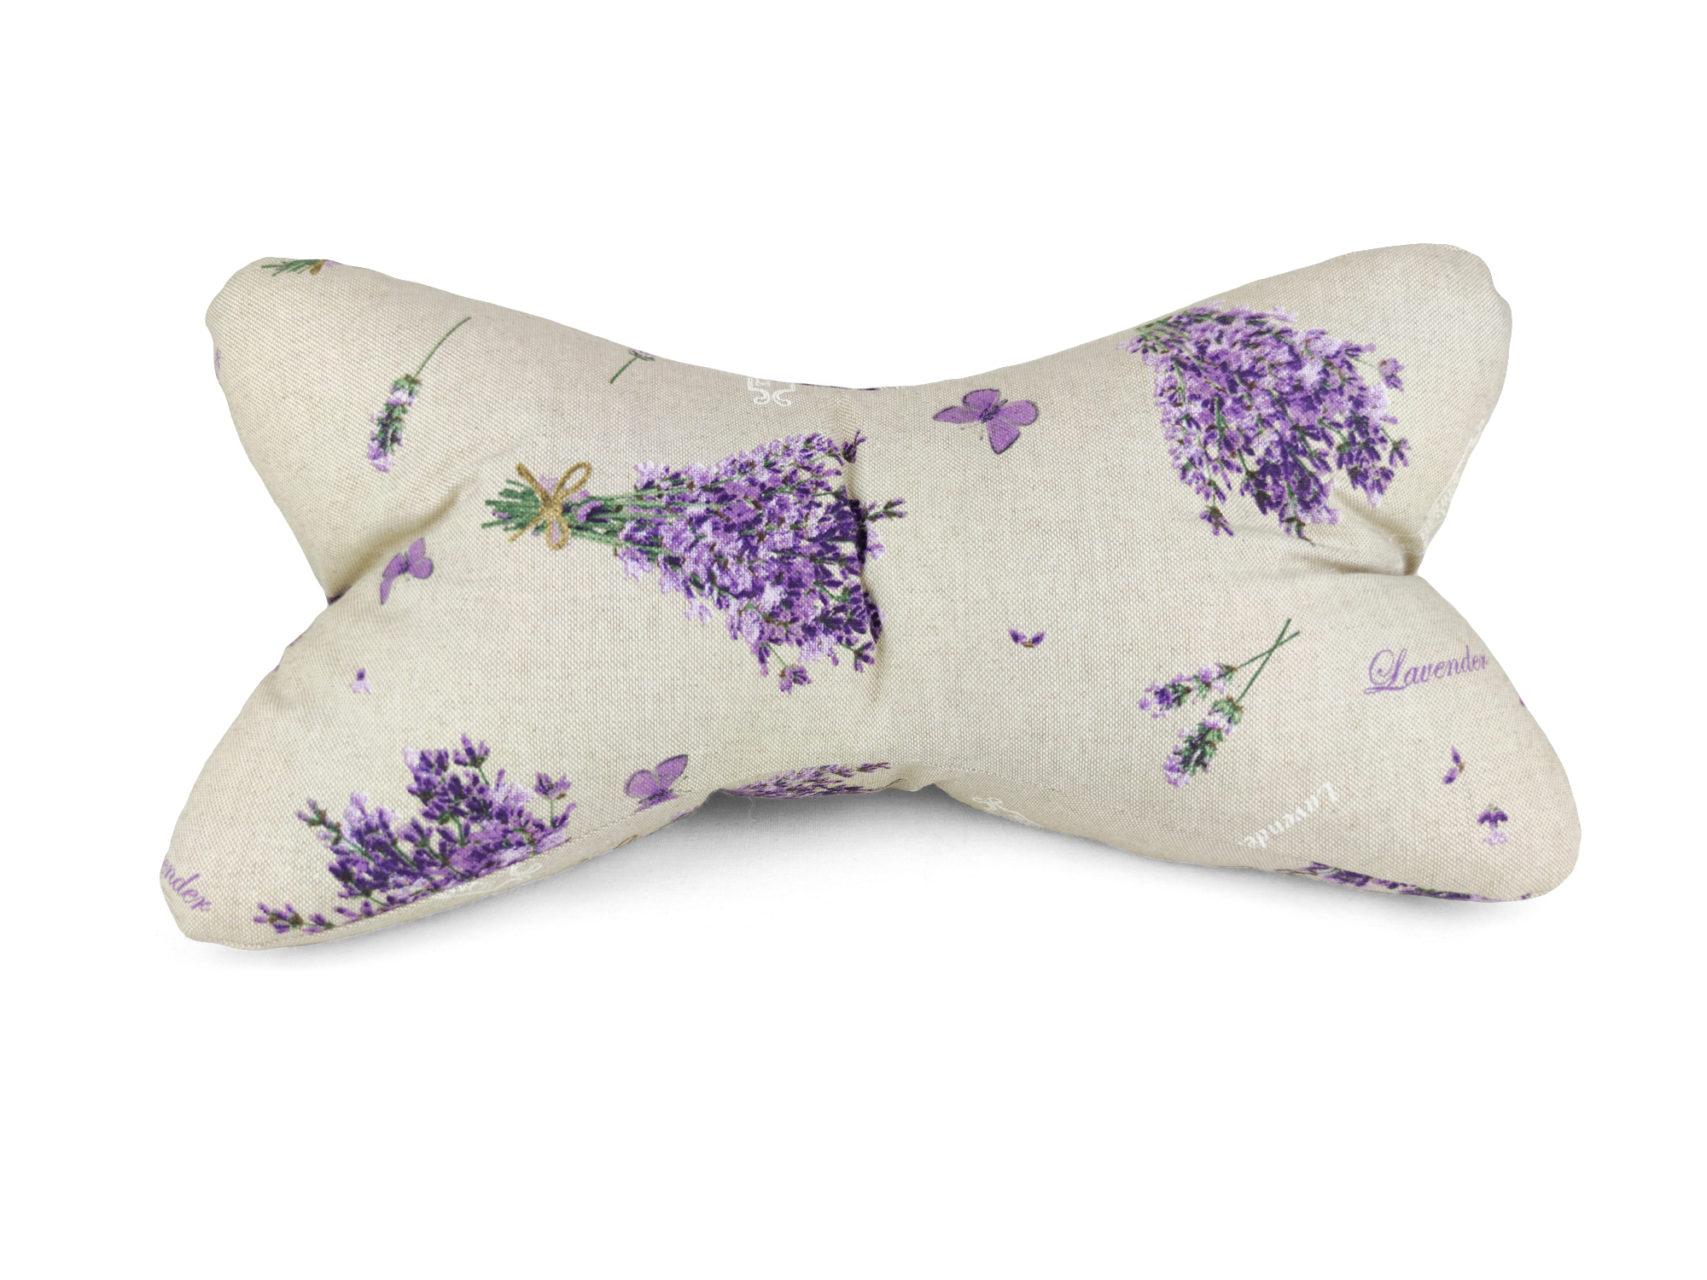 Leseknochen violette Lavendelsträuße Leinen Look